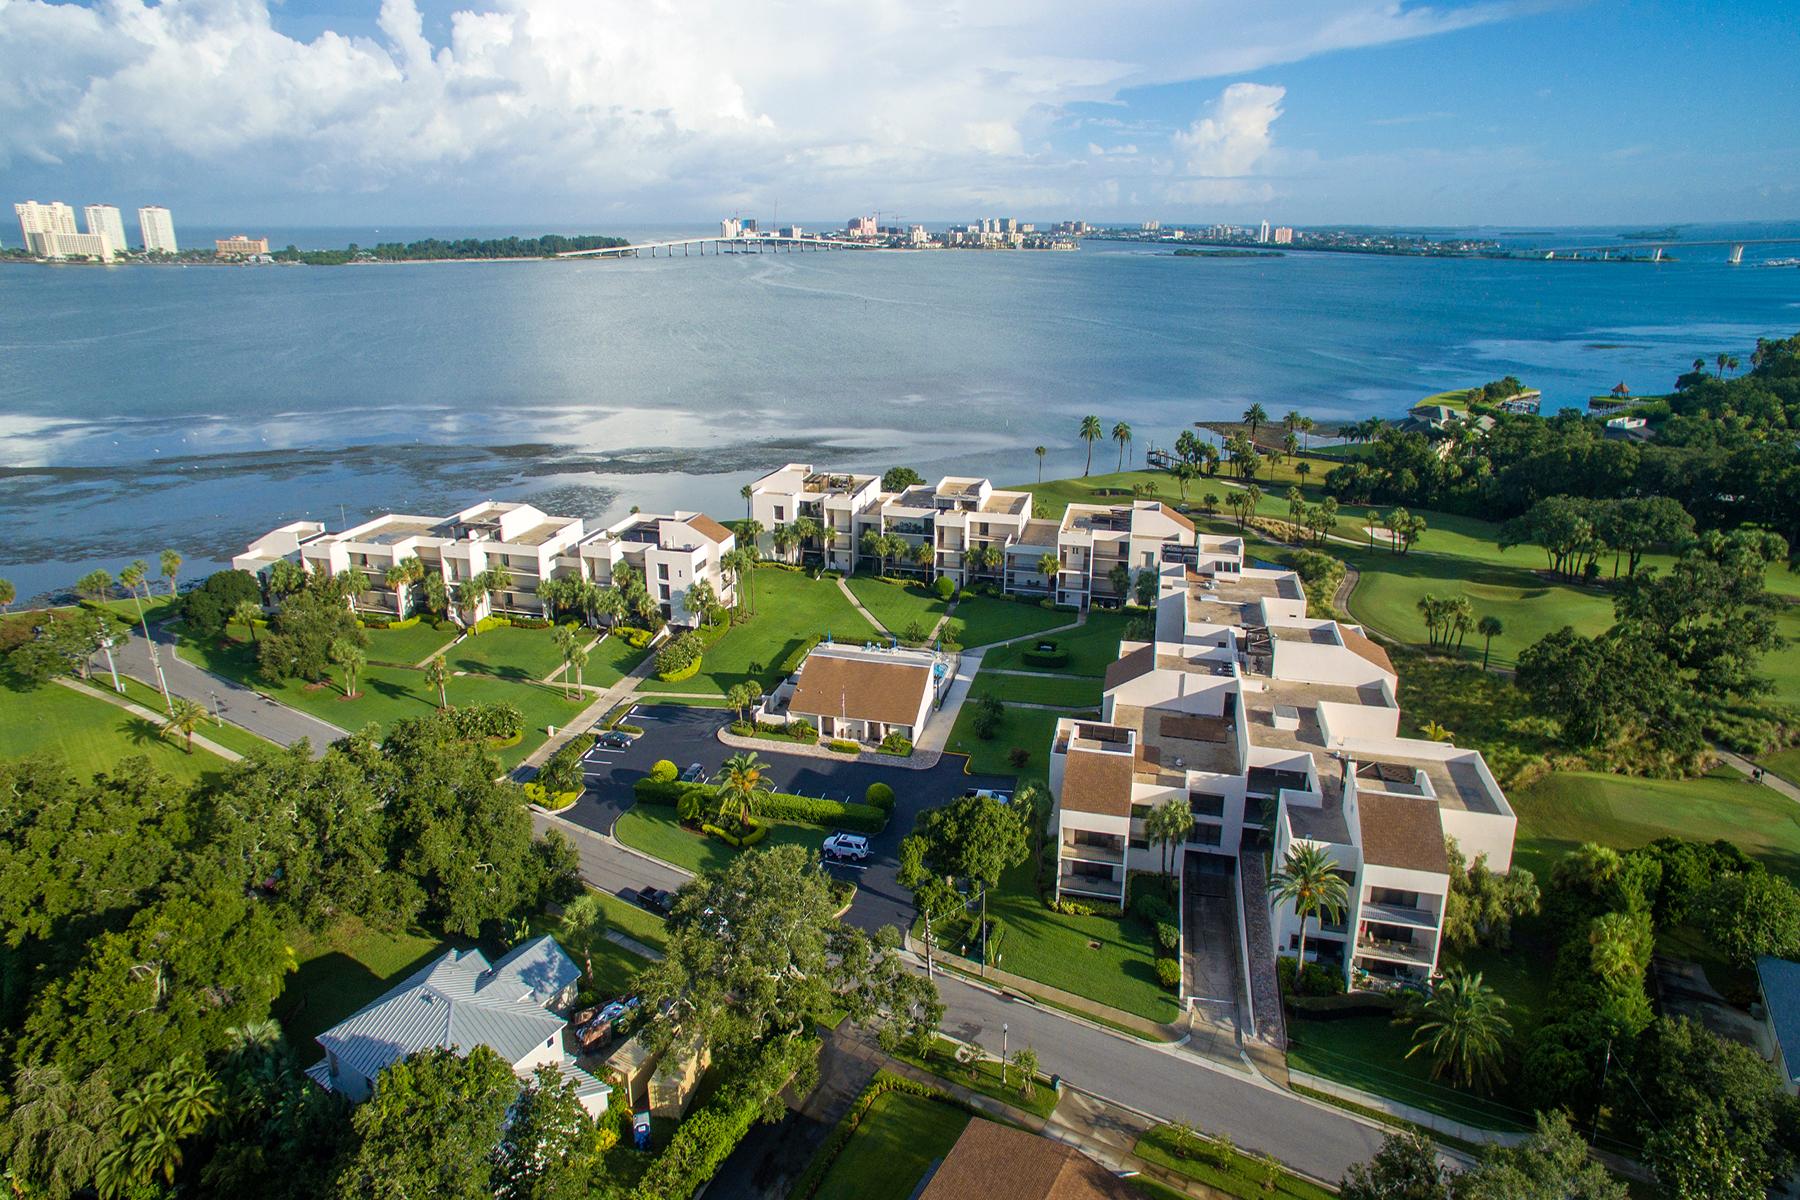 Condominium for Sale at BELLEAIR 50 Coe Rd 319 Belleair, Florida 33756 United States